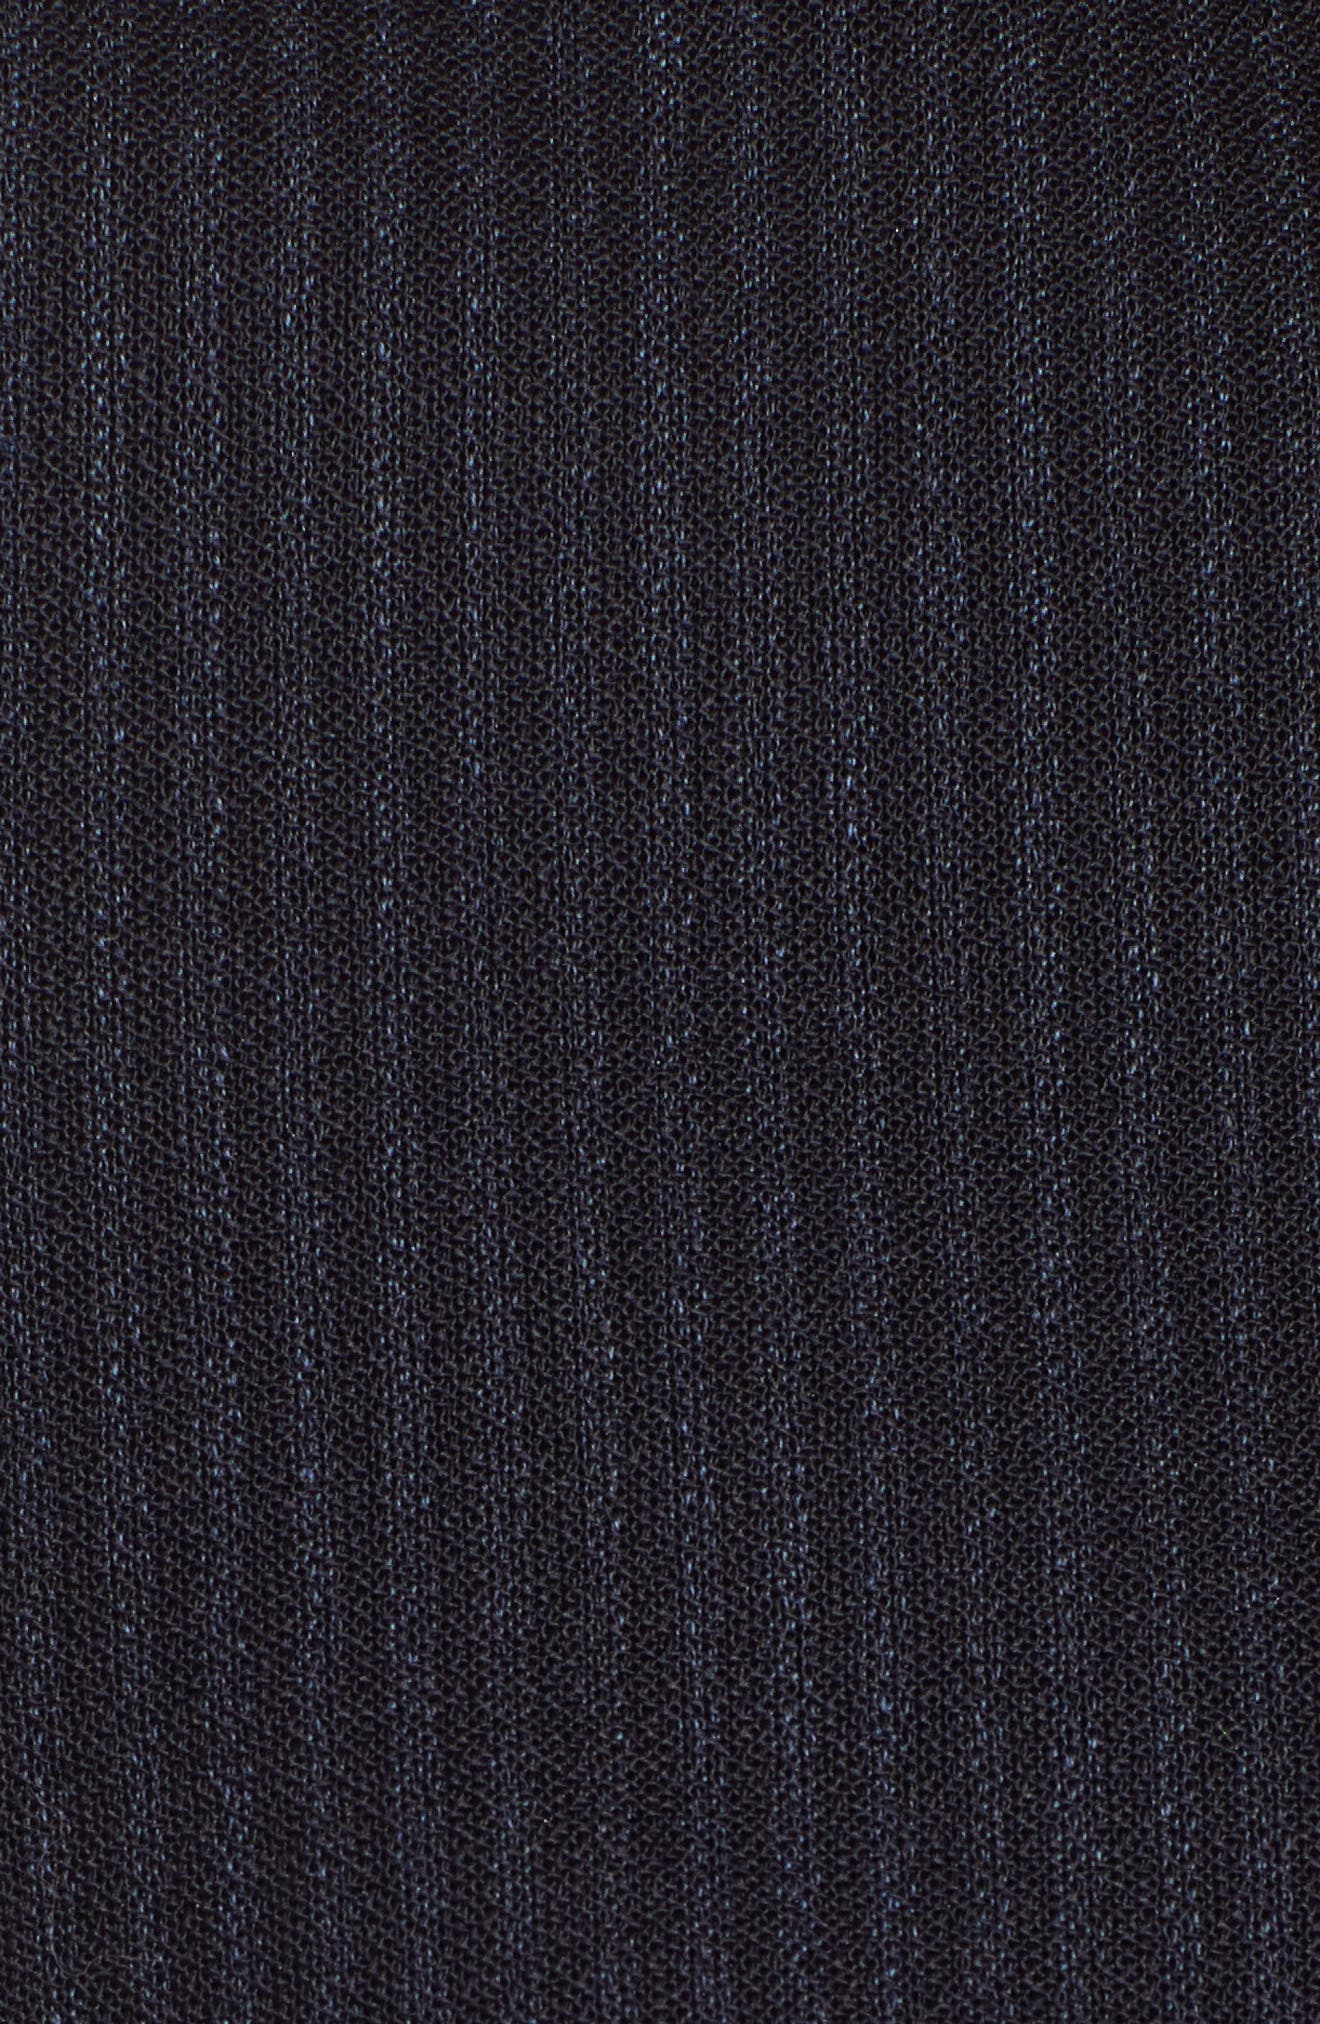 Jasyma Tonal Stripe Stretch Wool Suit Jacket,                             Alternate thumbnail 5, color,                             Navy Fantasy